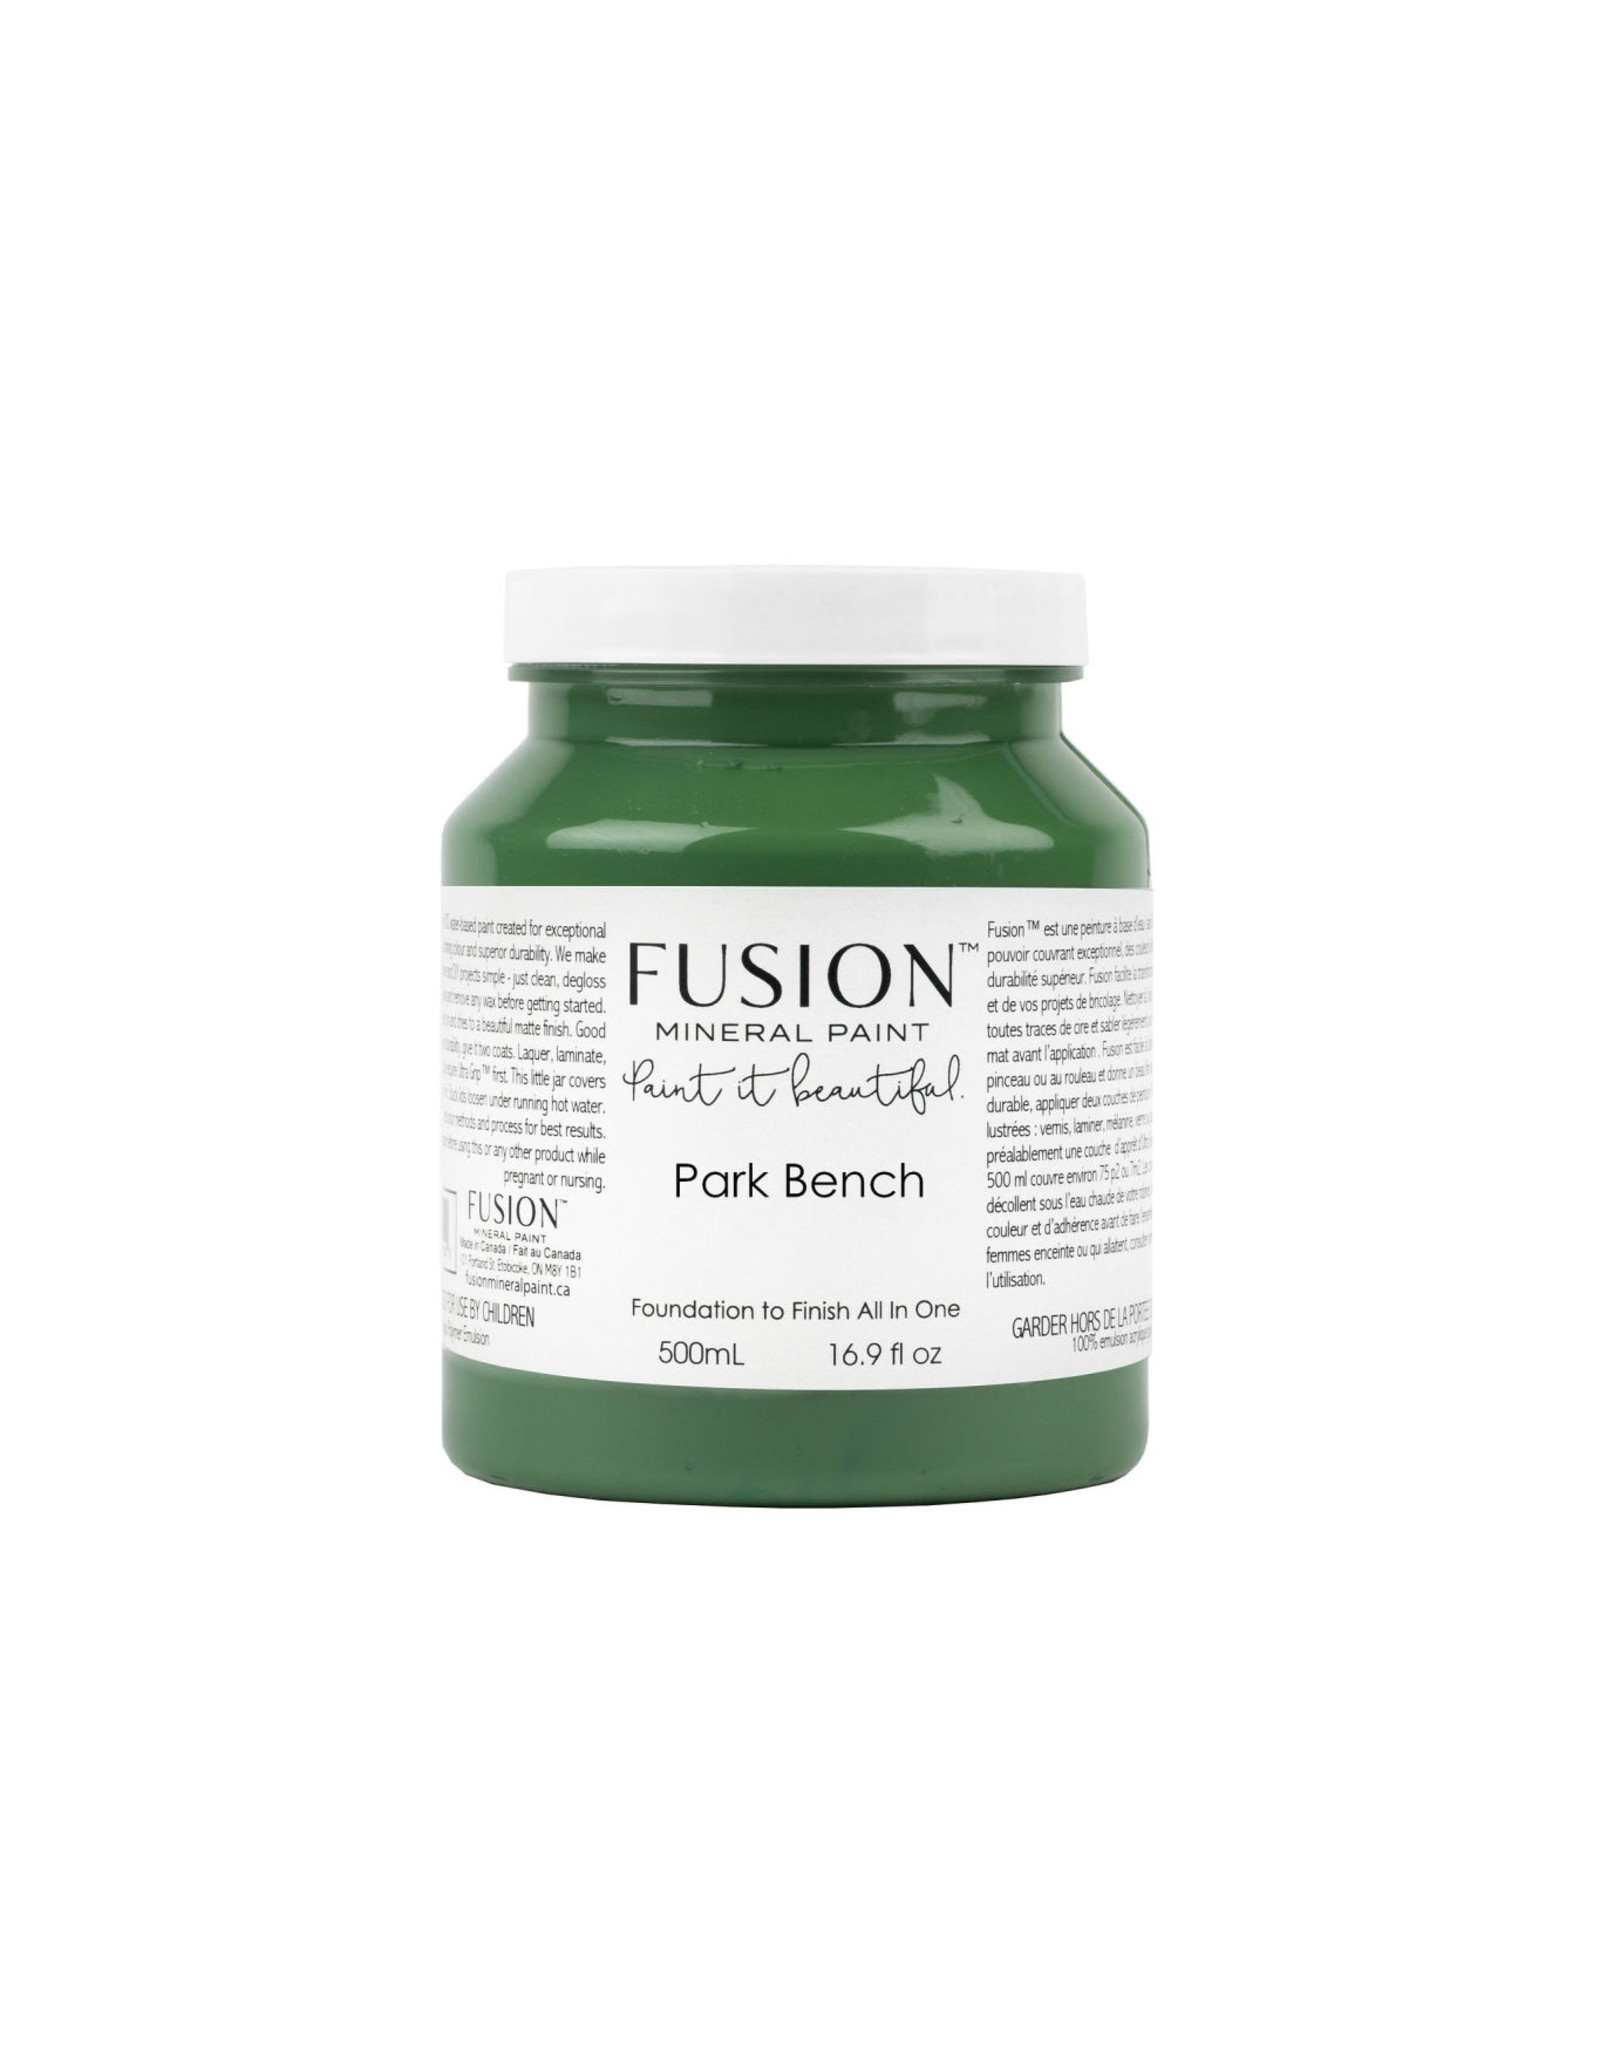 Fusion Mineral Paint Fusion Mineral Paint - Park Bench 500ml